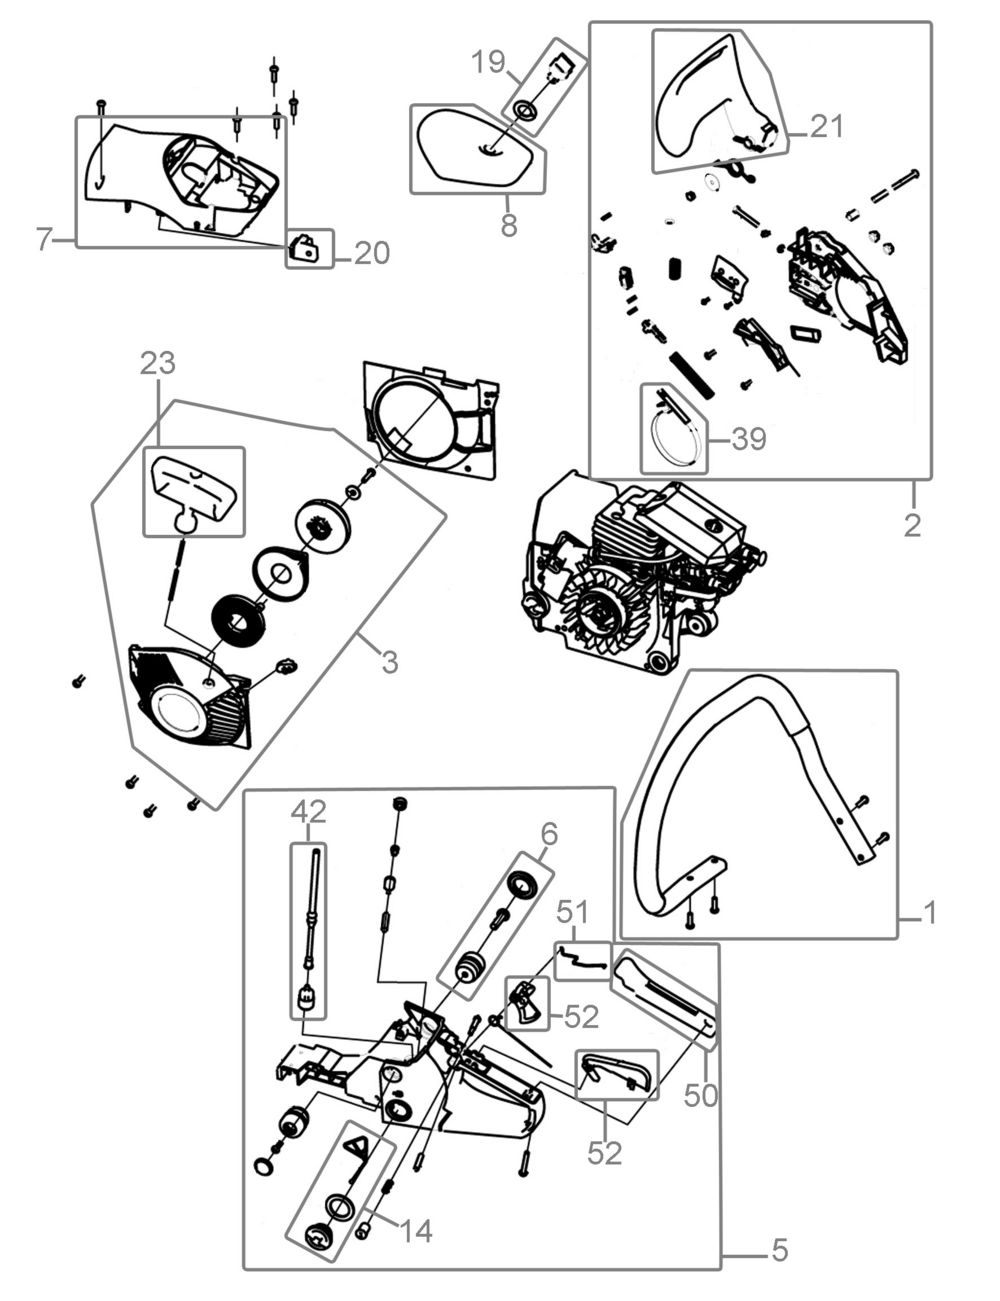 Benzinschlauch passend Güde KS400B Motorsäge